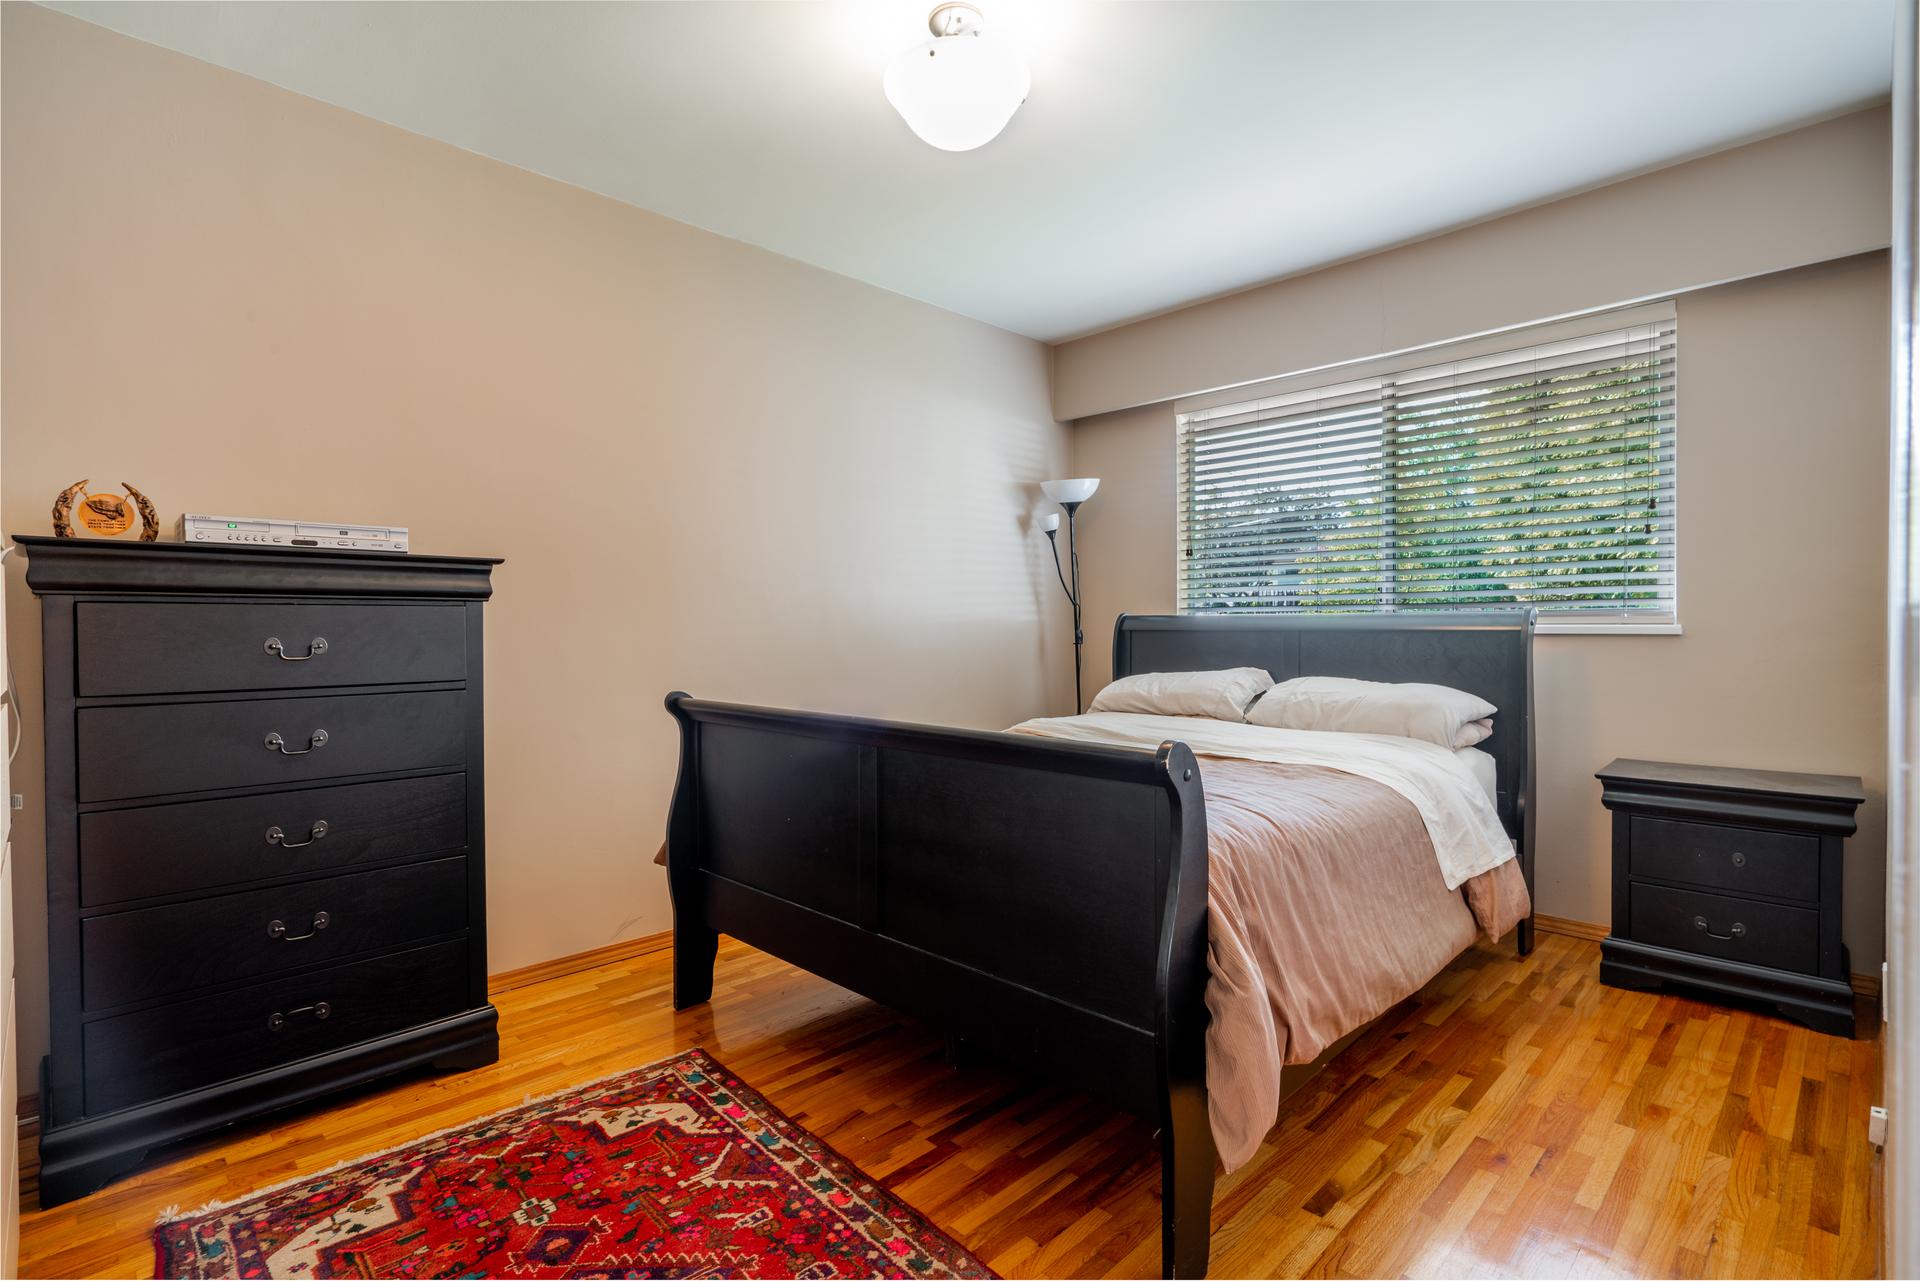 4034-delbrook-avenue-north-vancouver-23 at 4034 Delbrook Avenue, Upper Delbrook, North Vancouver